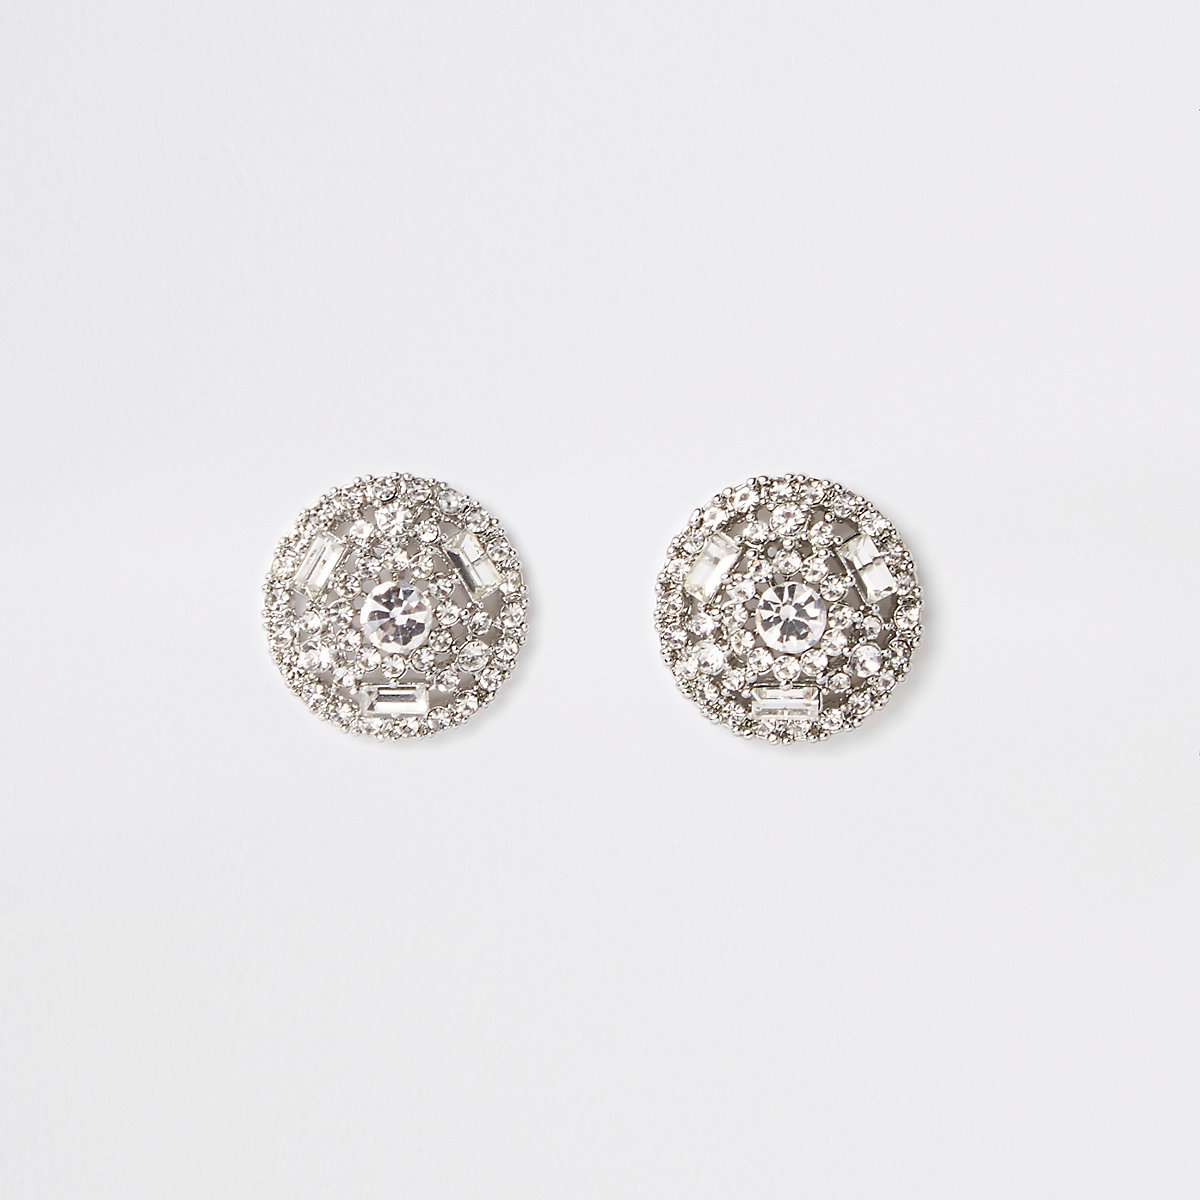 Silver color round rhinestone stud earrings